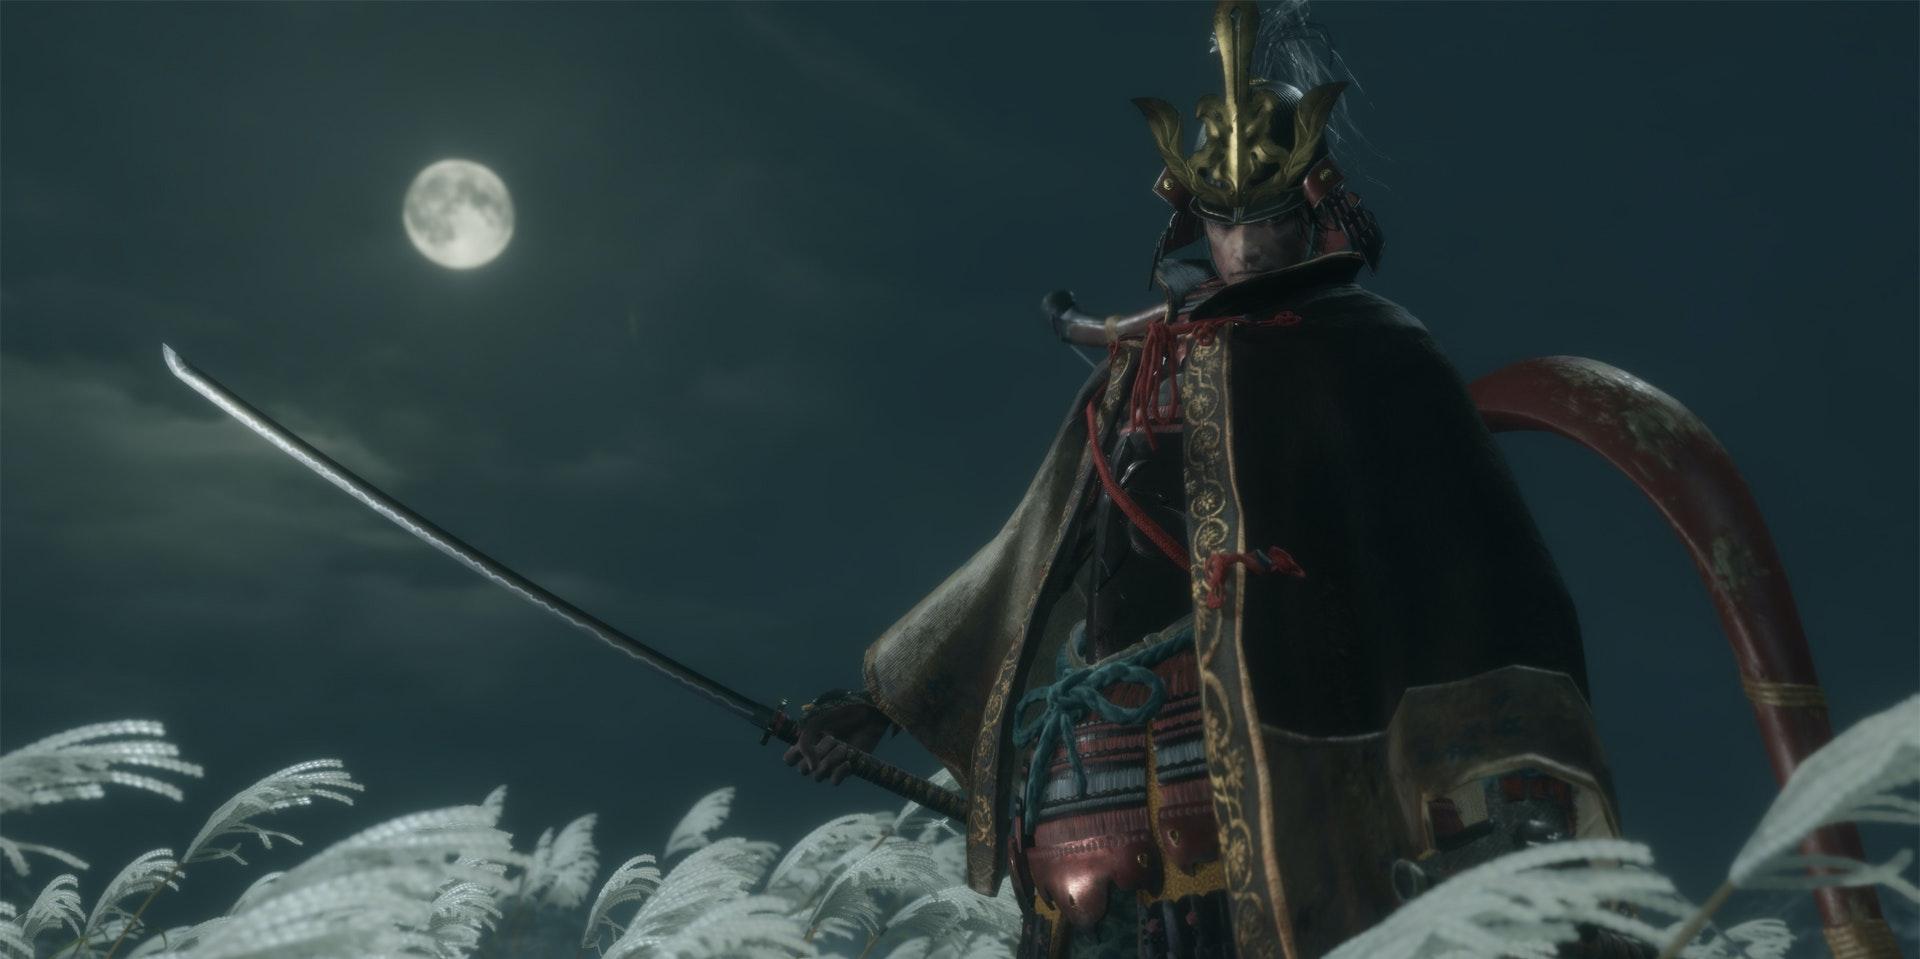 'Sekiro: Shadows Die Twice' Already Feels Better Than a Soulsborne Game